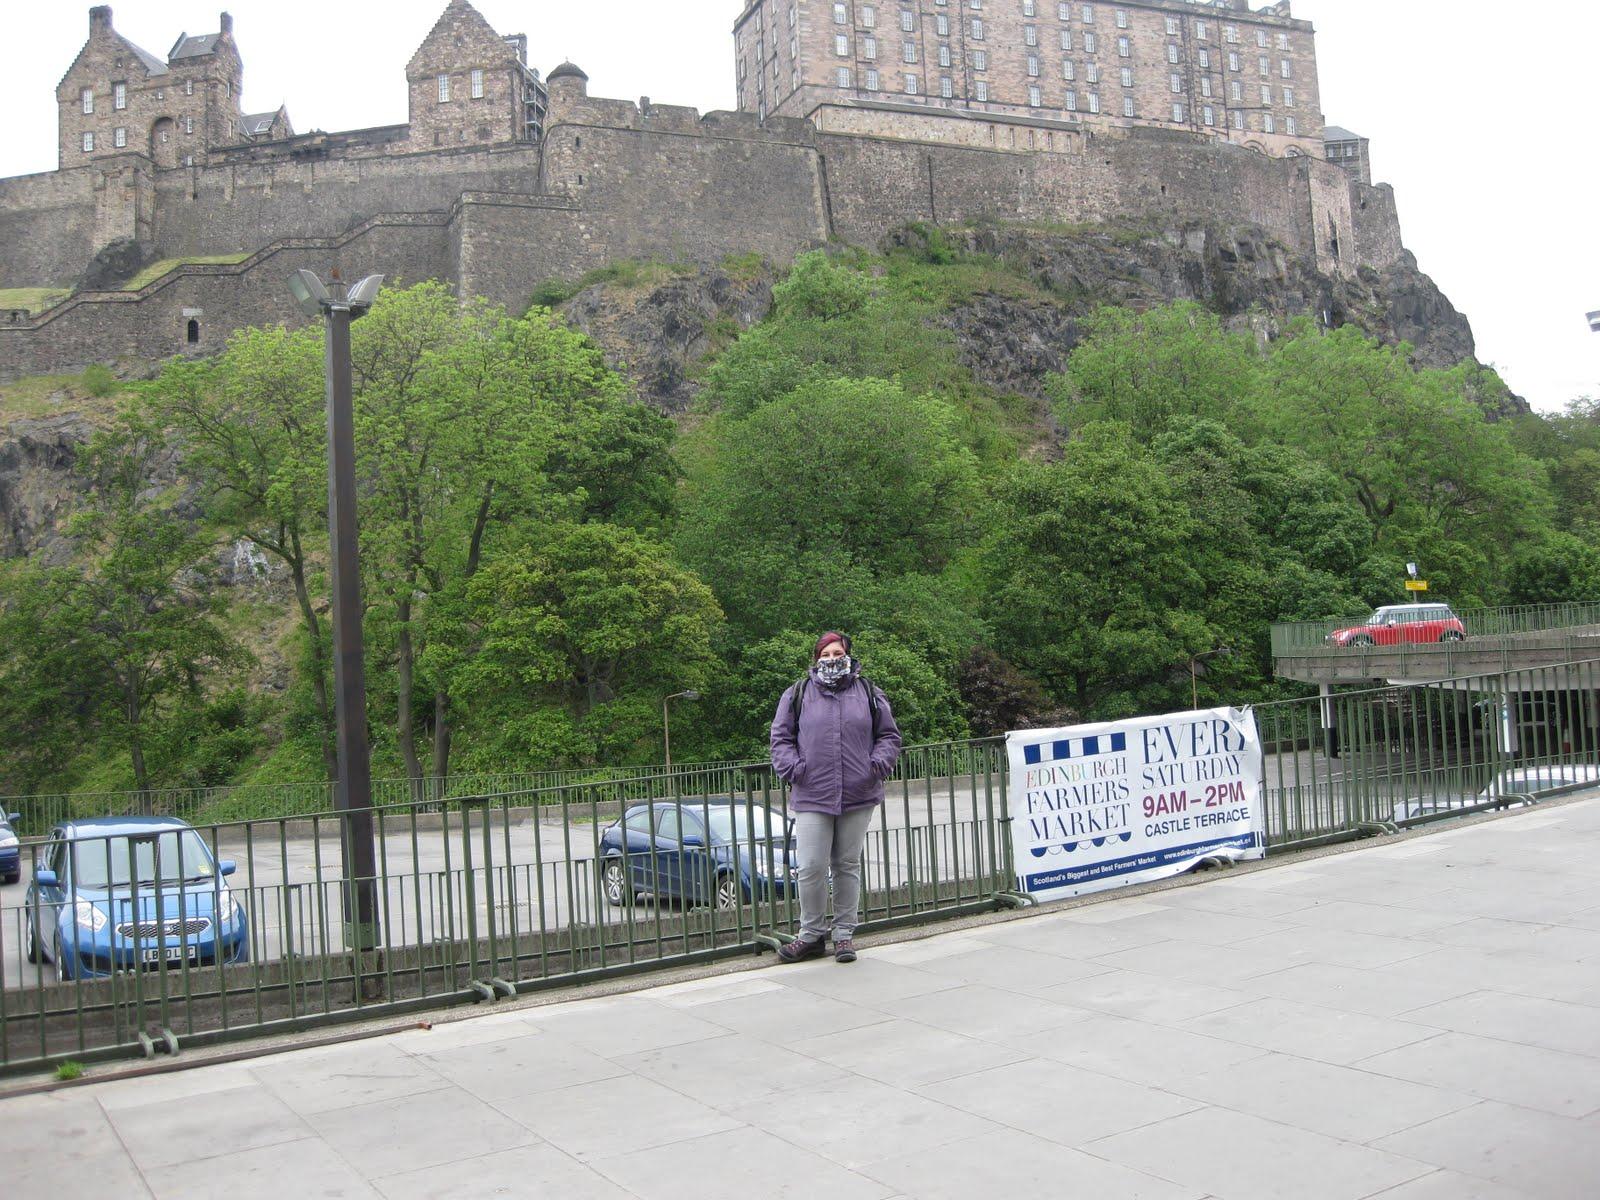 Viajes y rutas de una motera escocia 2011 5 etapa for Oficina turismo edimburgo